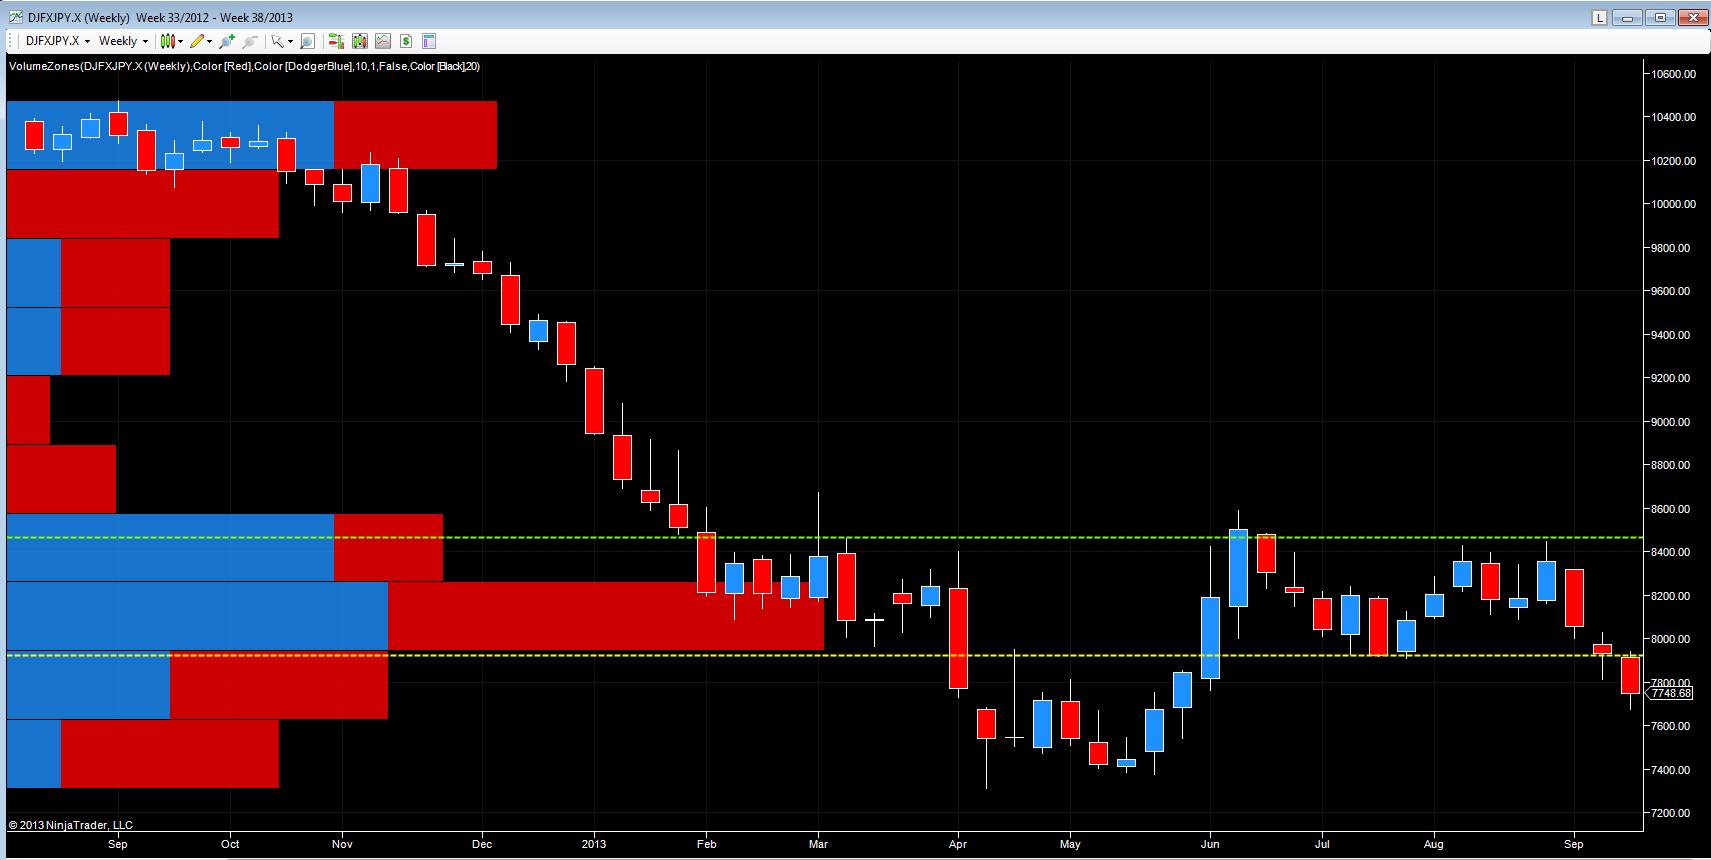 Yen index - weekly chart